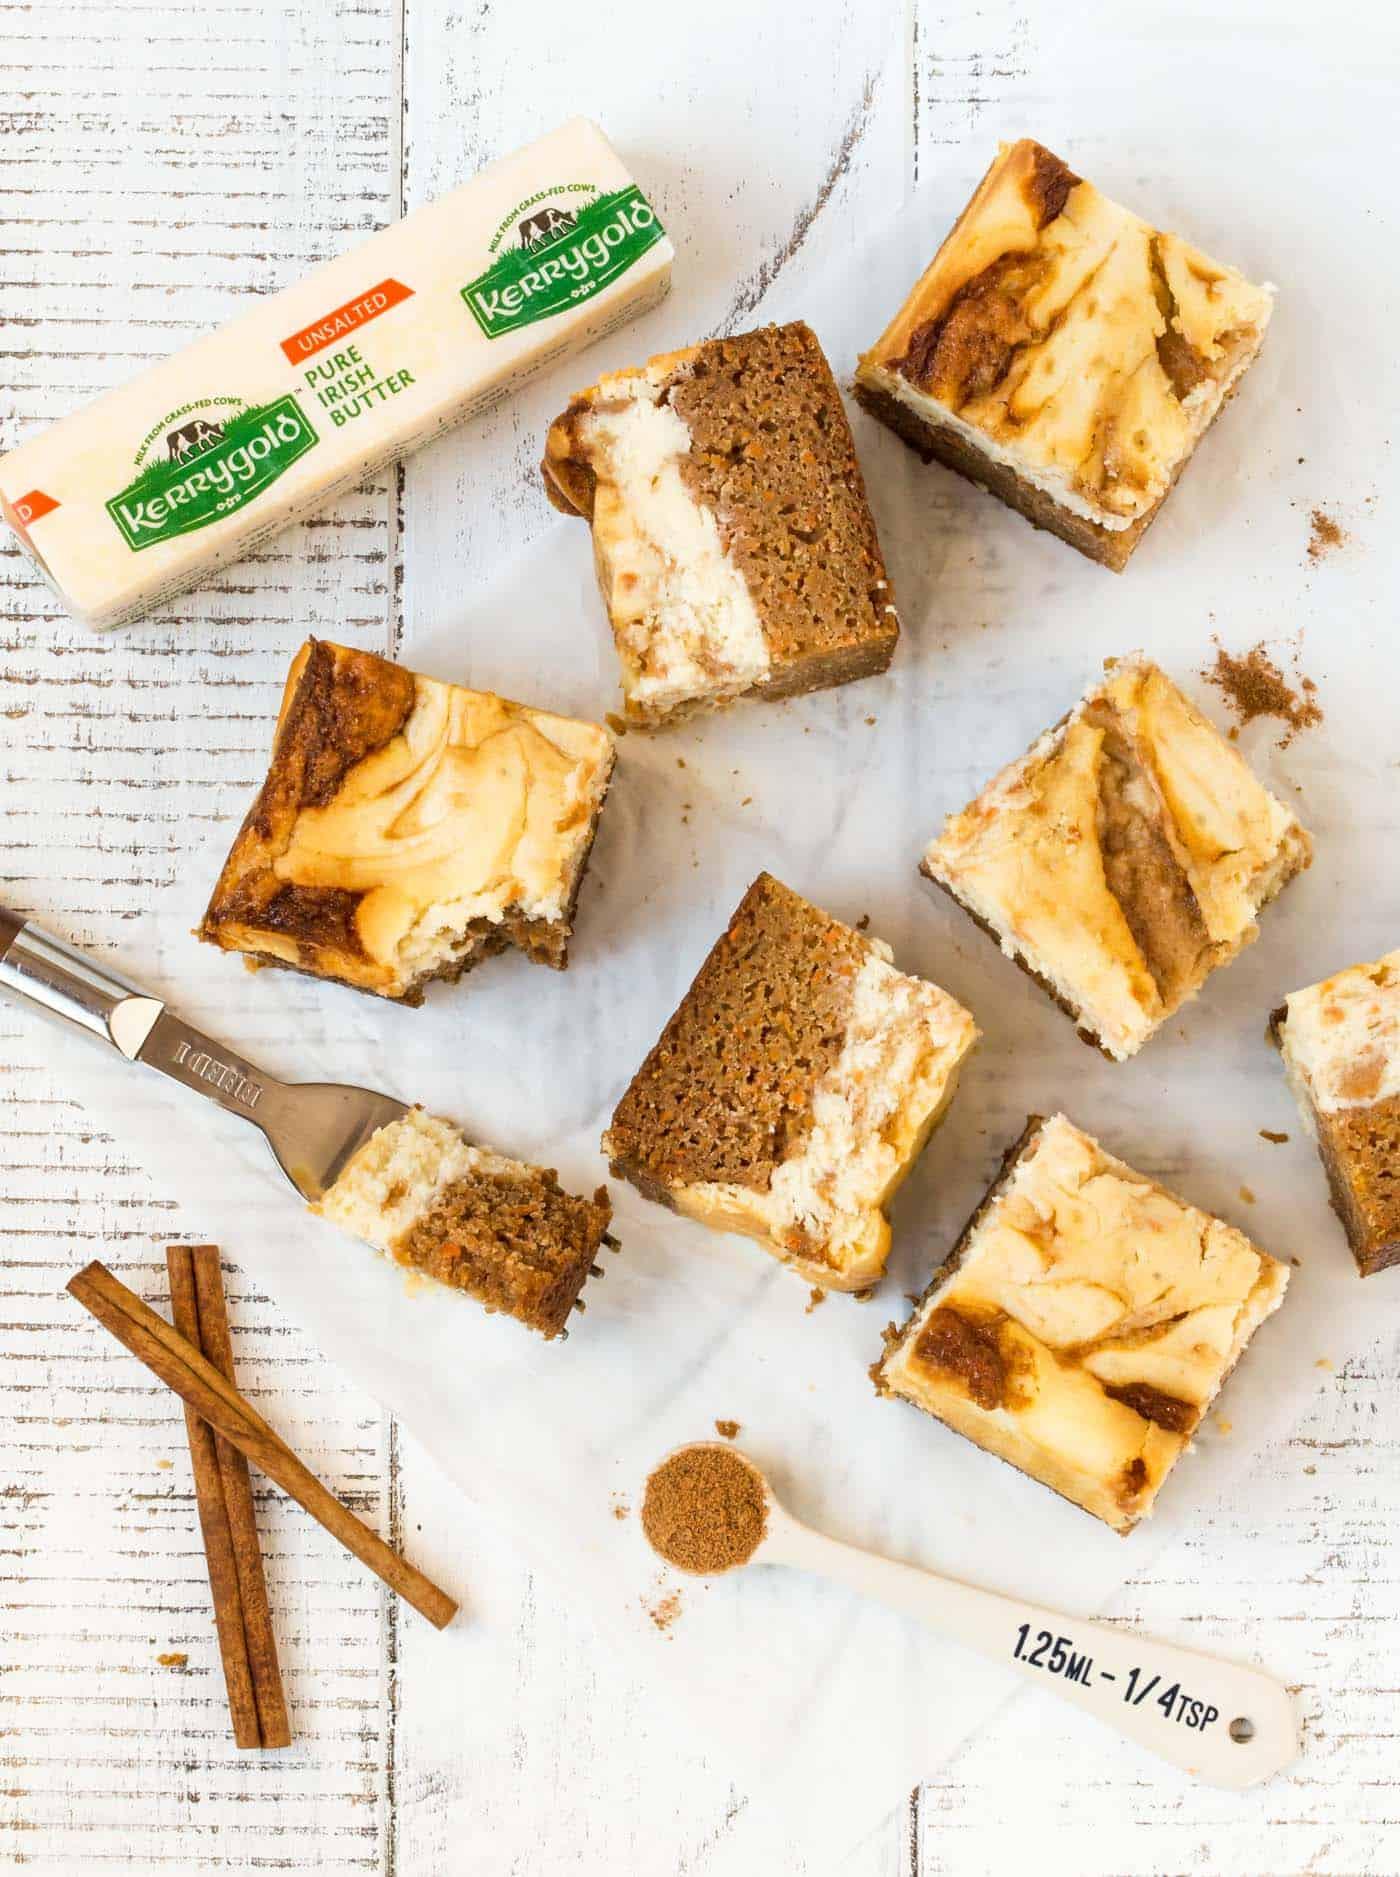 cut carrot cake cheesecake bars on white background with fresh cinnamon sticks for garnish.